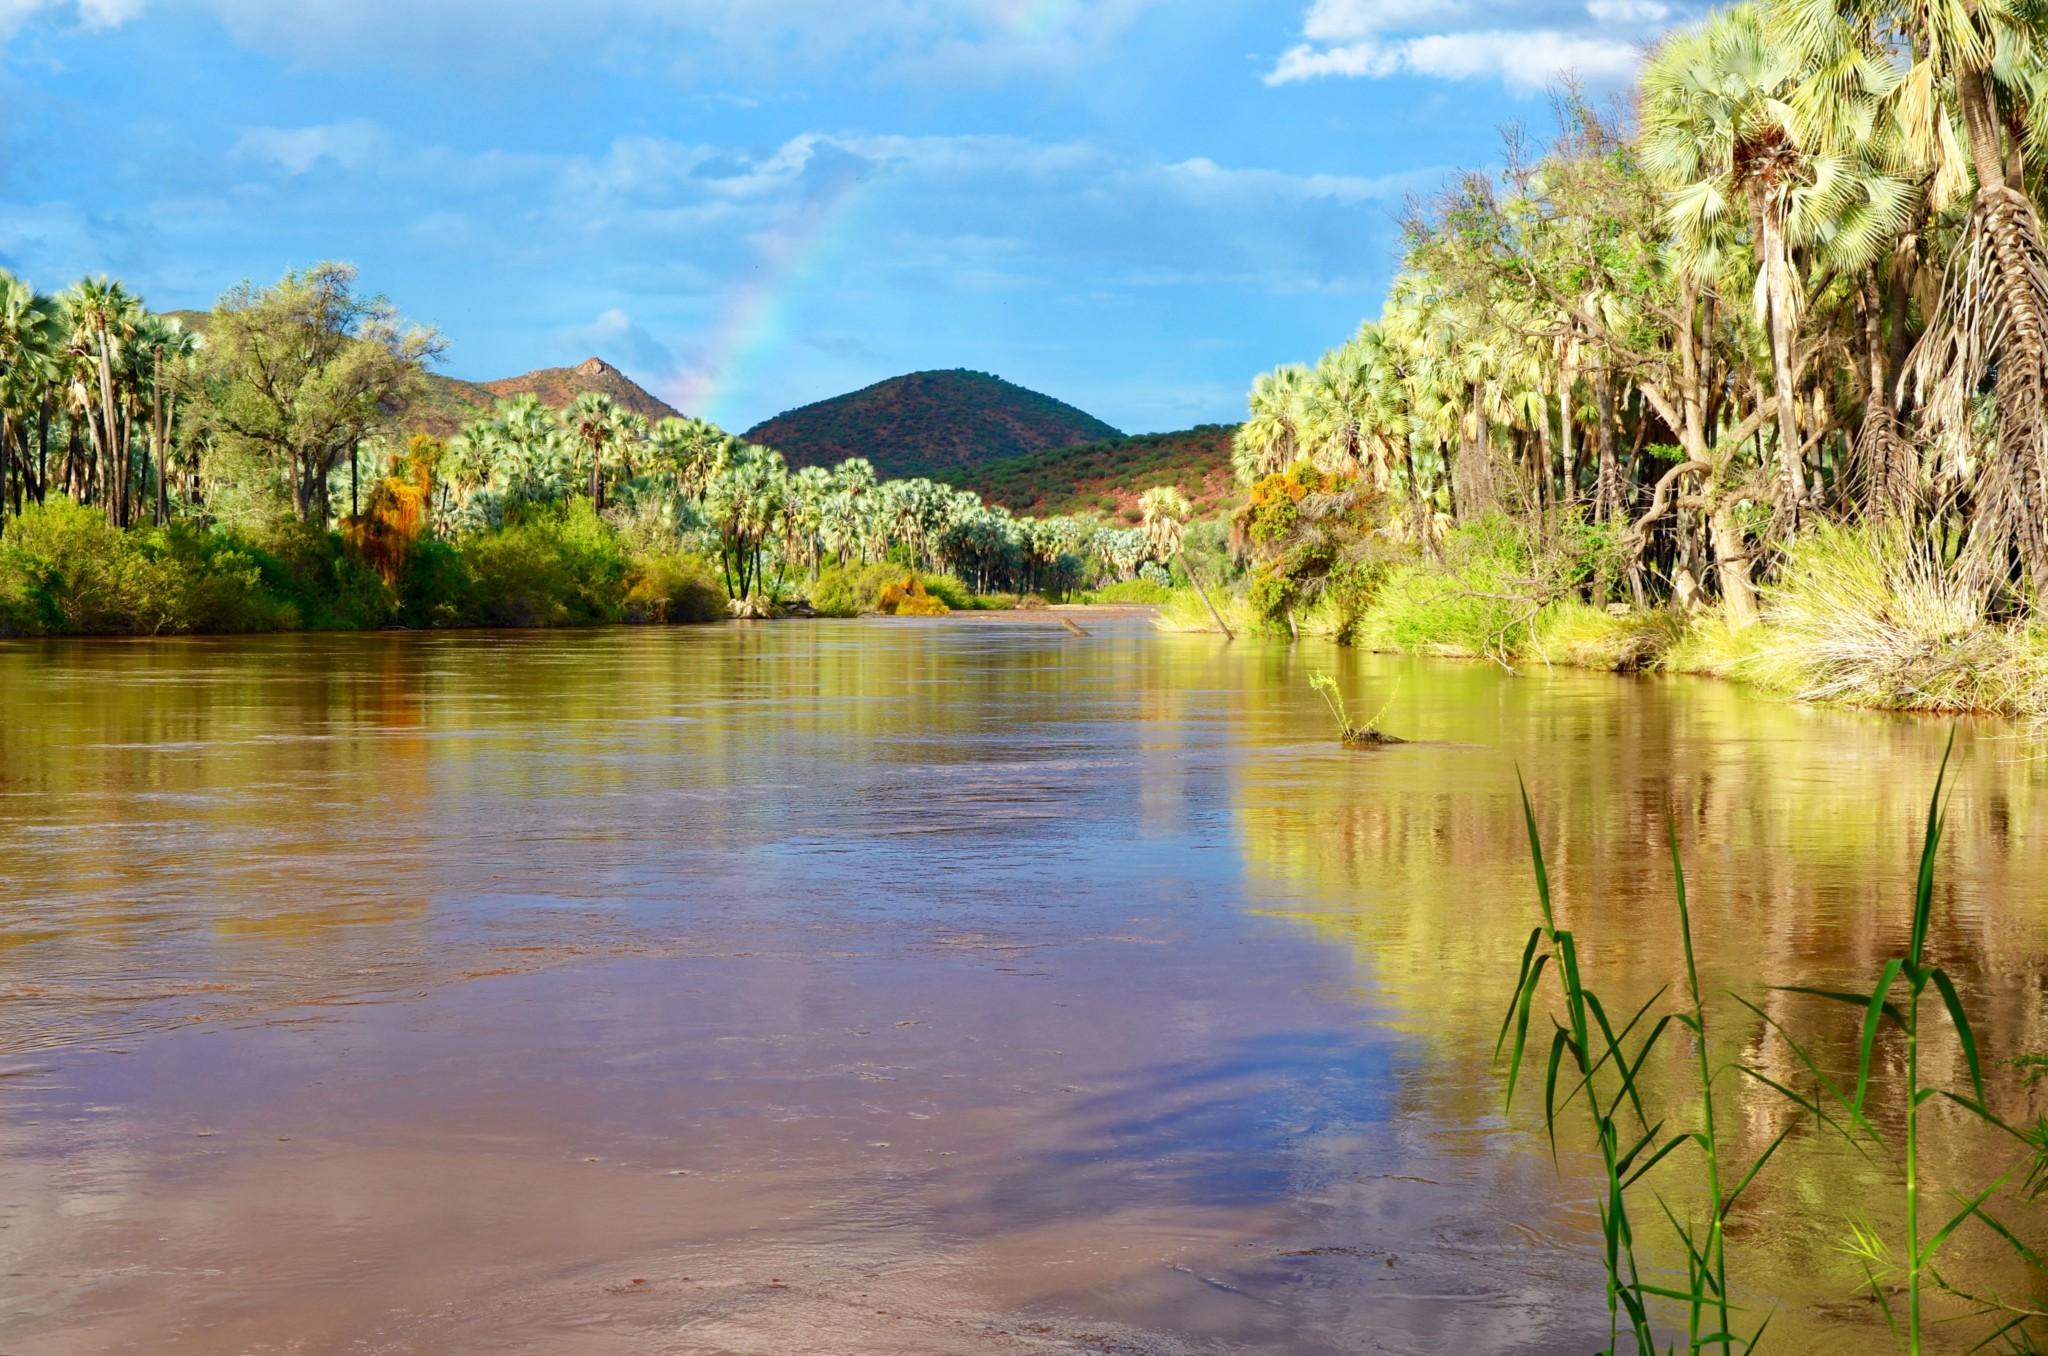 Kunene River - Namibia u. Angola